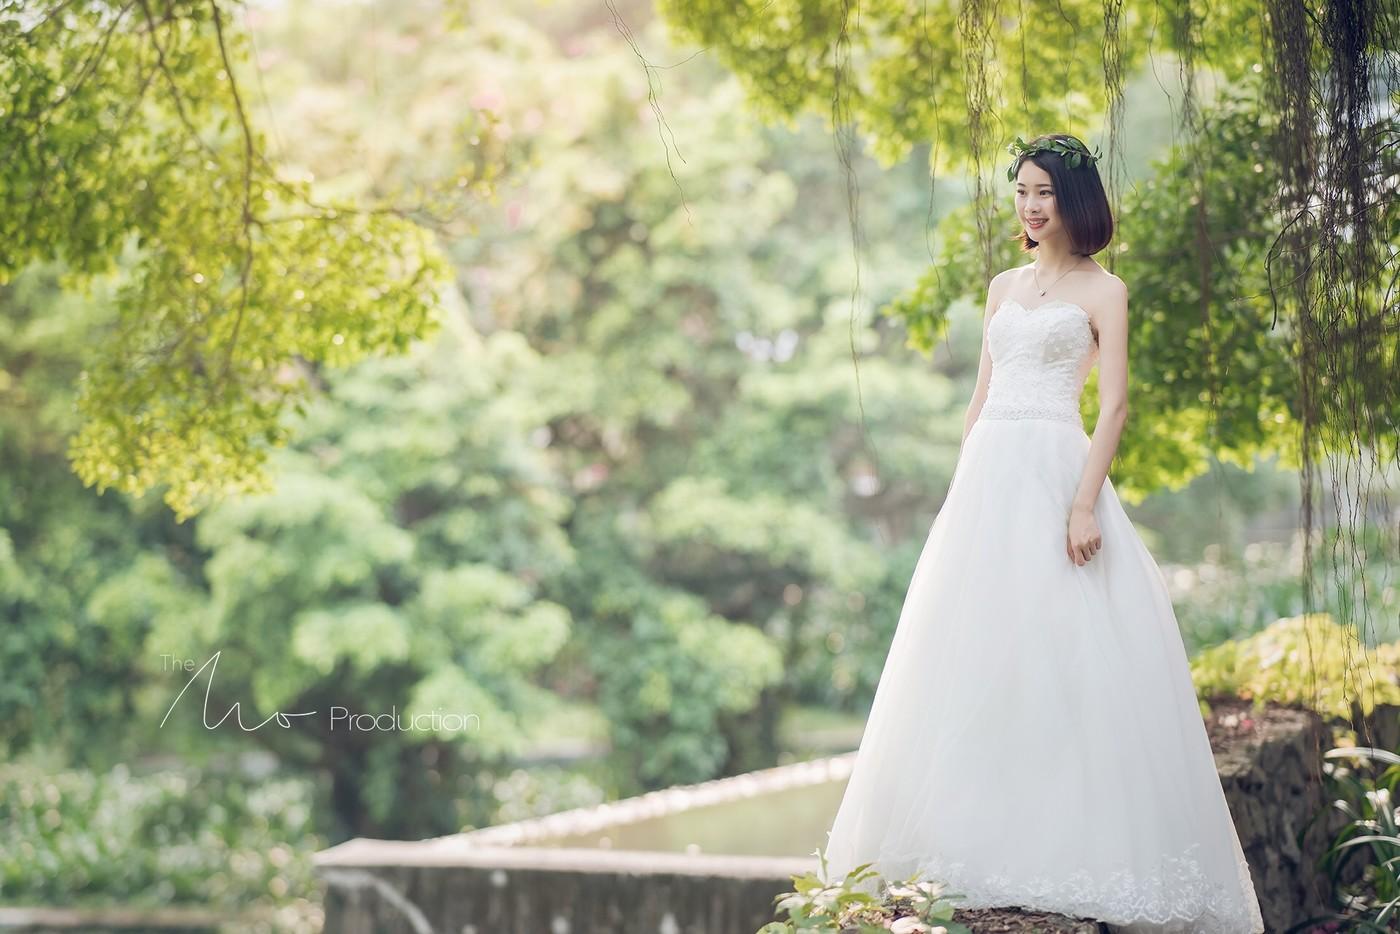 MoFoTo 深圳婚纱个人2